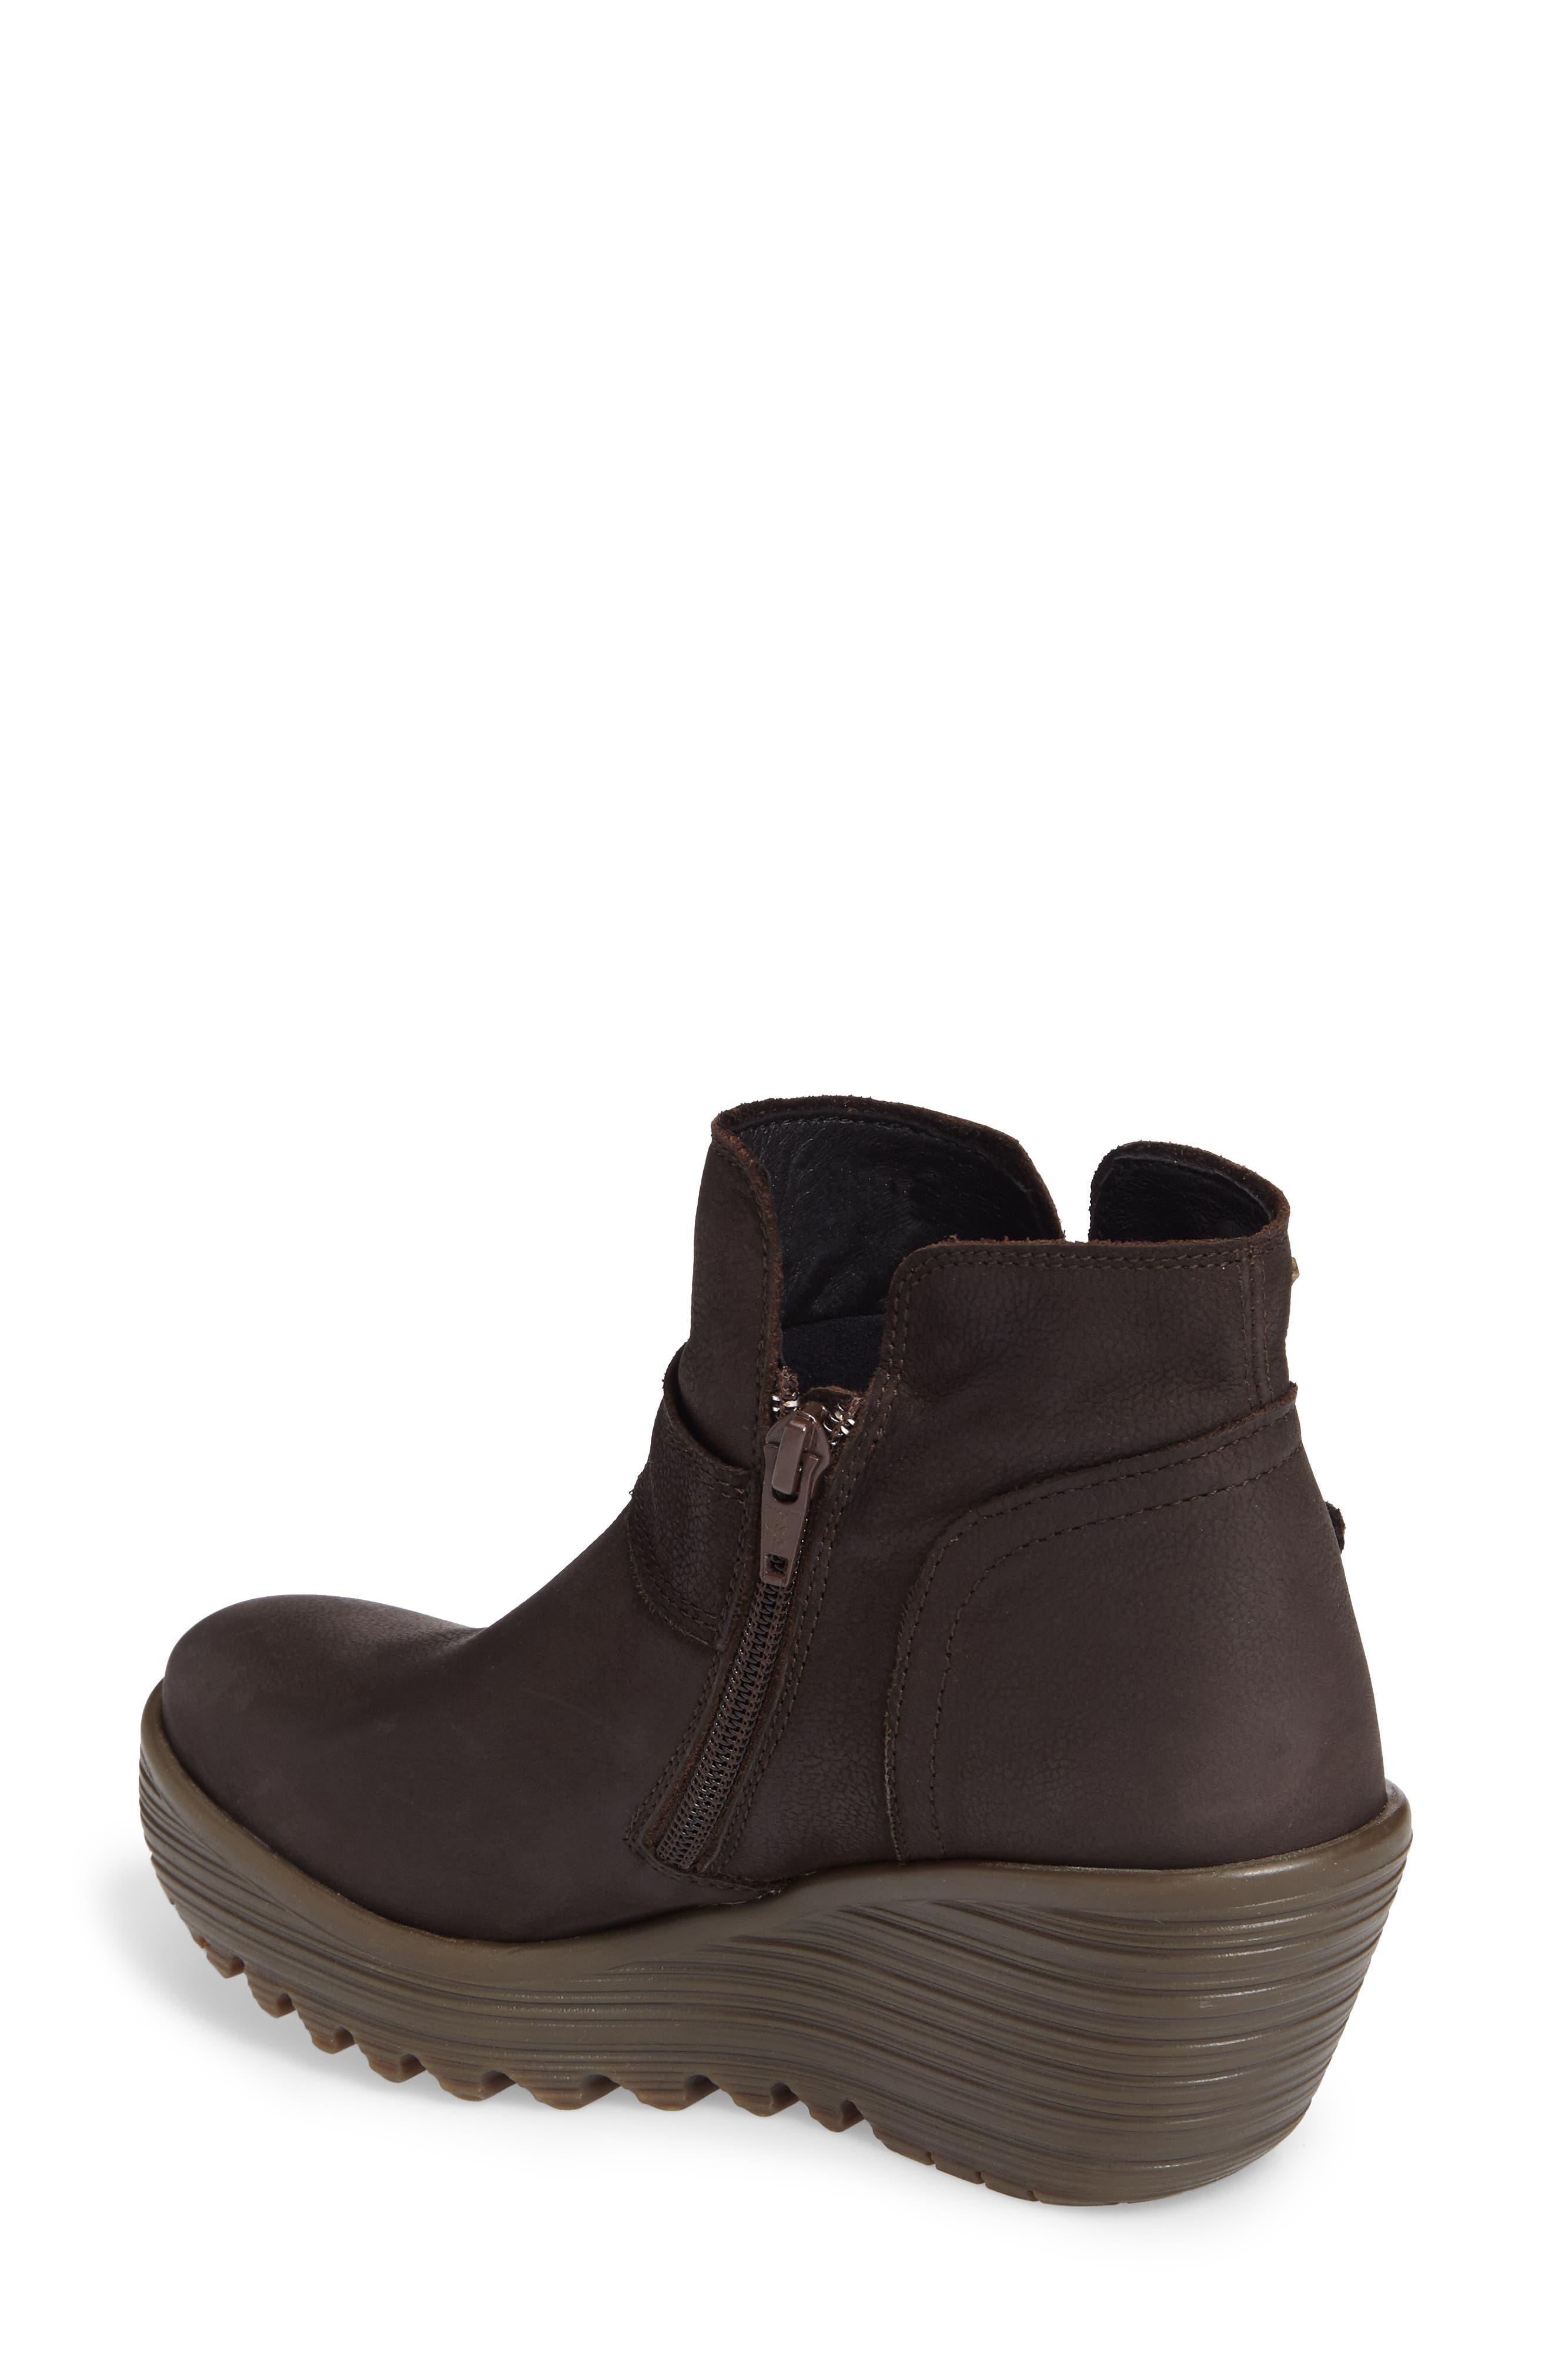 Alternate Image 2  - Fly London Yock Waterproof Gore-Tex® Wedge Boot (Women)